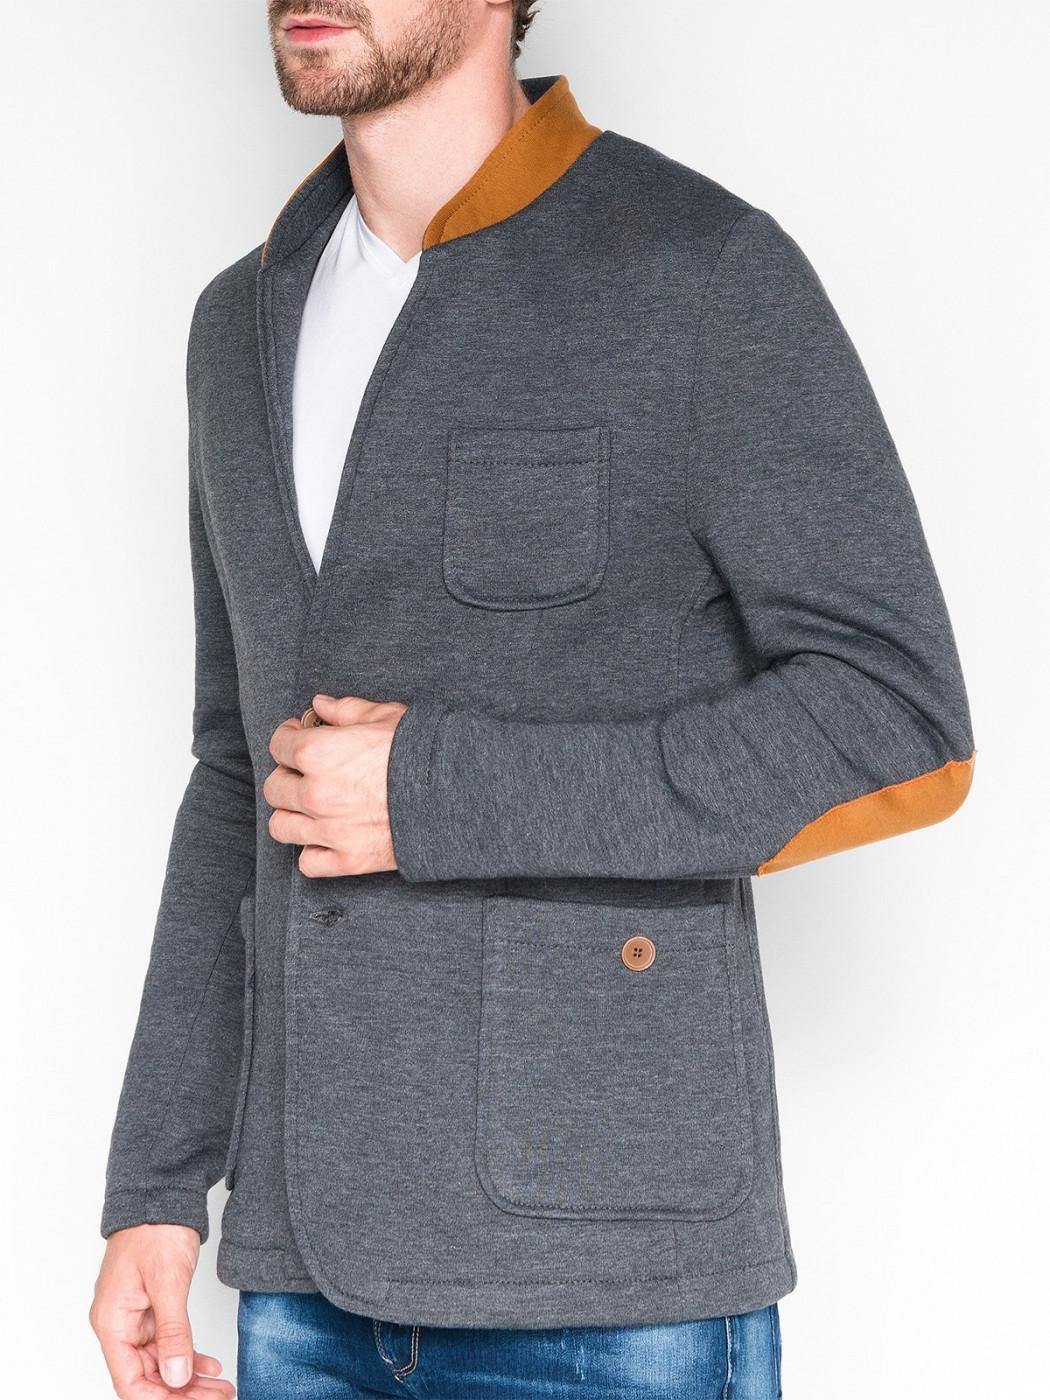 Ombre Clothing Men's casual blazer jacket M07